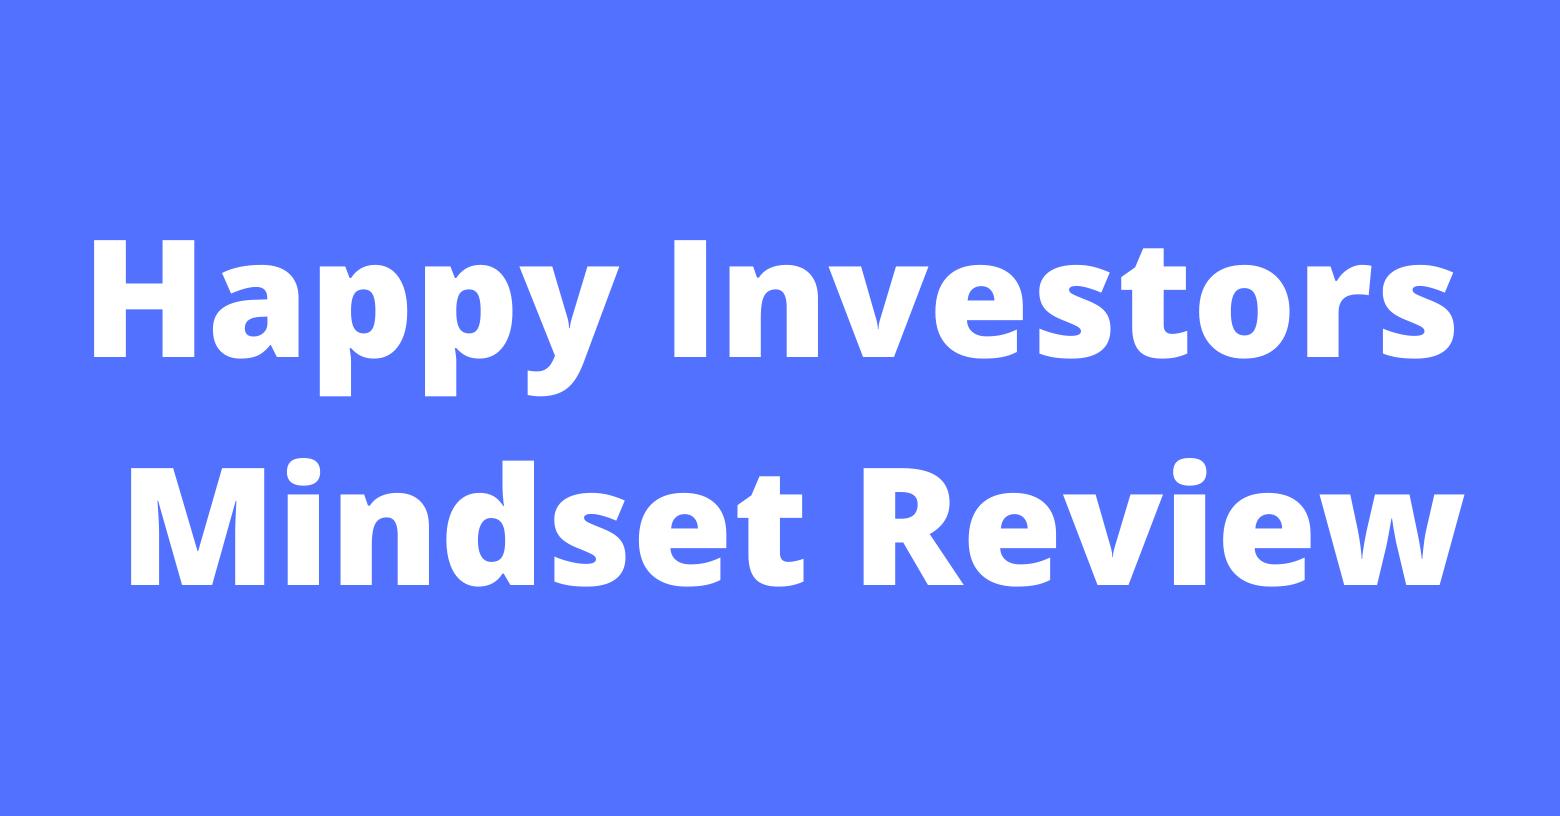 Happy Investors Mindset Review